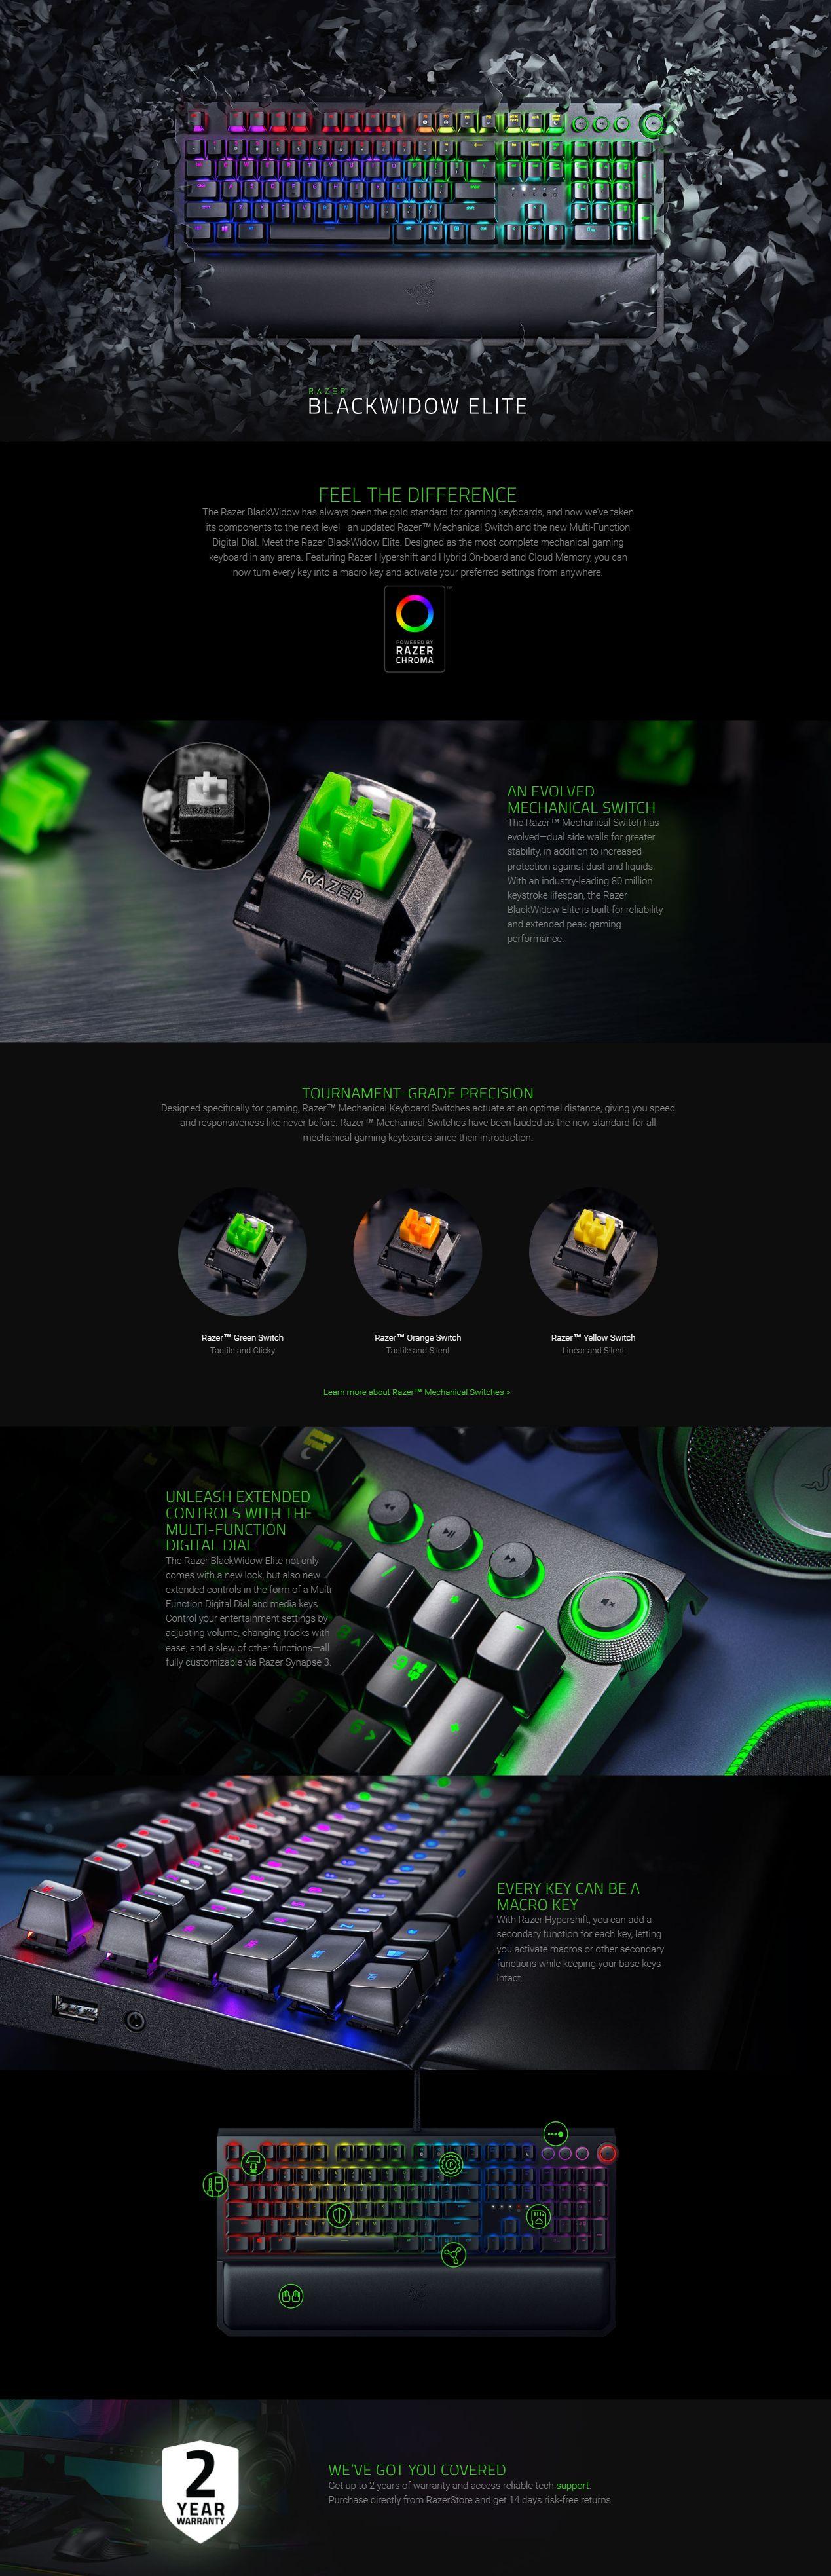 Razer BlackWidow Elite Chroma Mechanical Gaming Keyboard - Green Switch